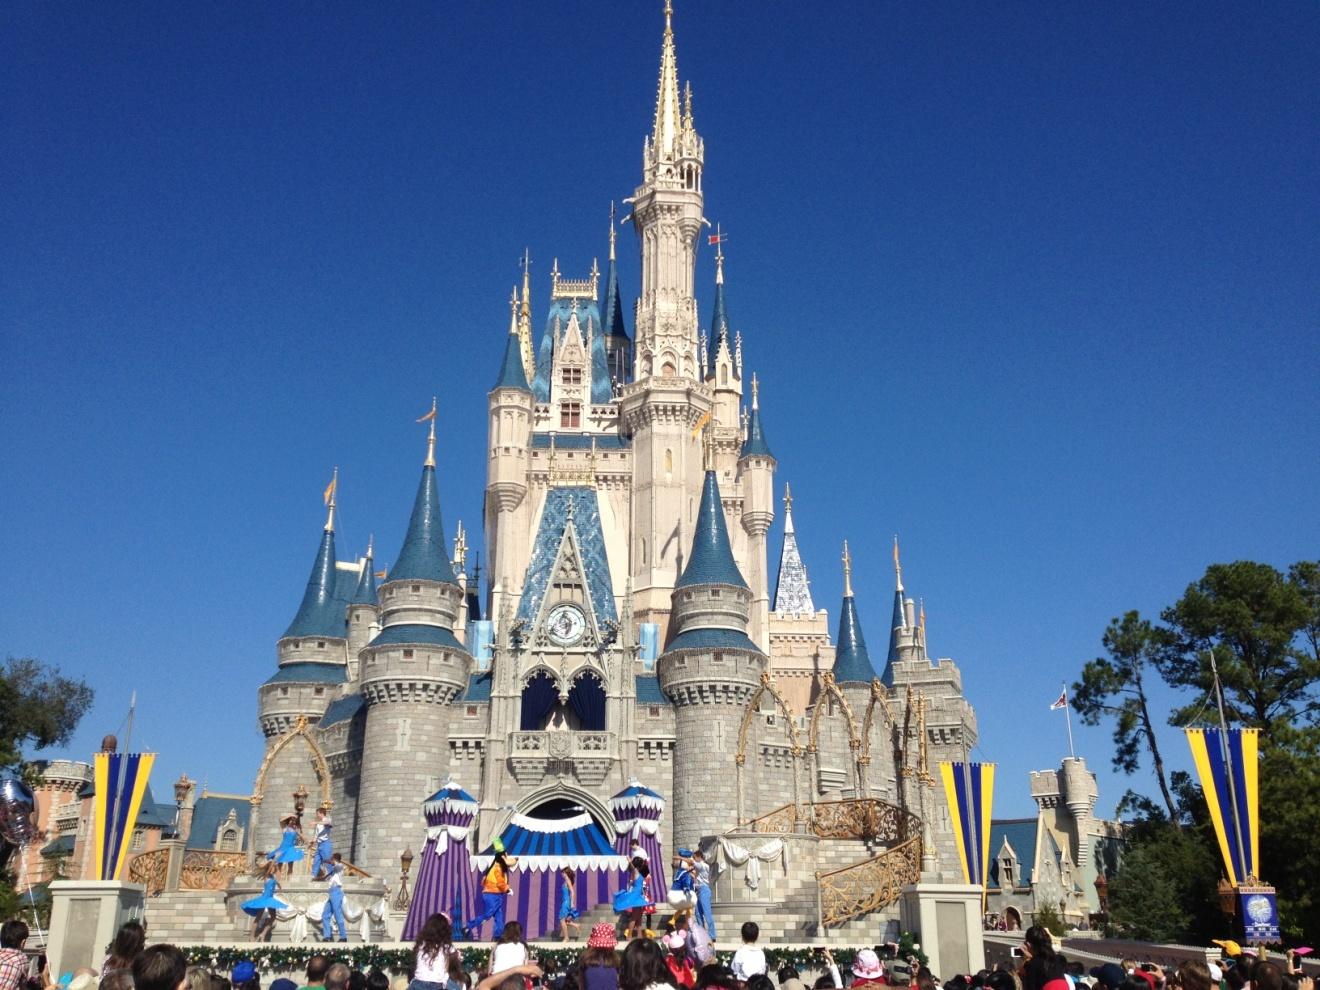 Disney World Princess Castle Images Pictures   Becuo 1320x990